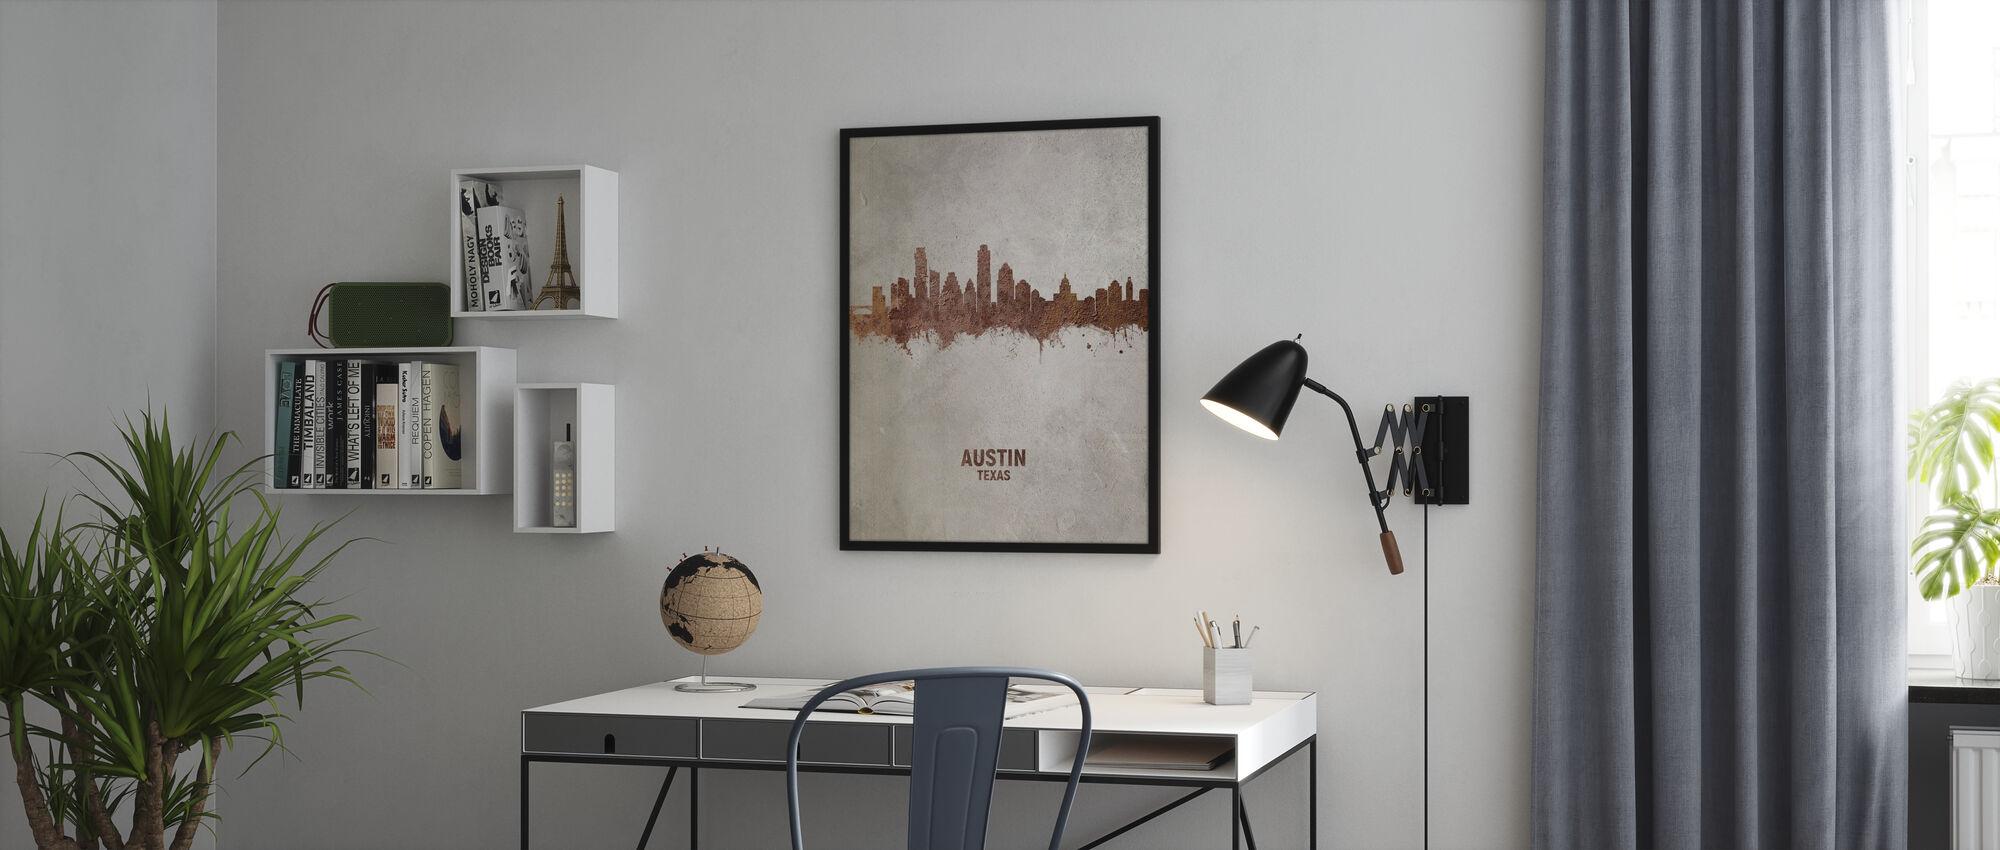 Austin Texas Skyline - Plakat - Kontor